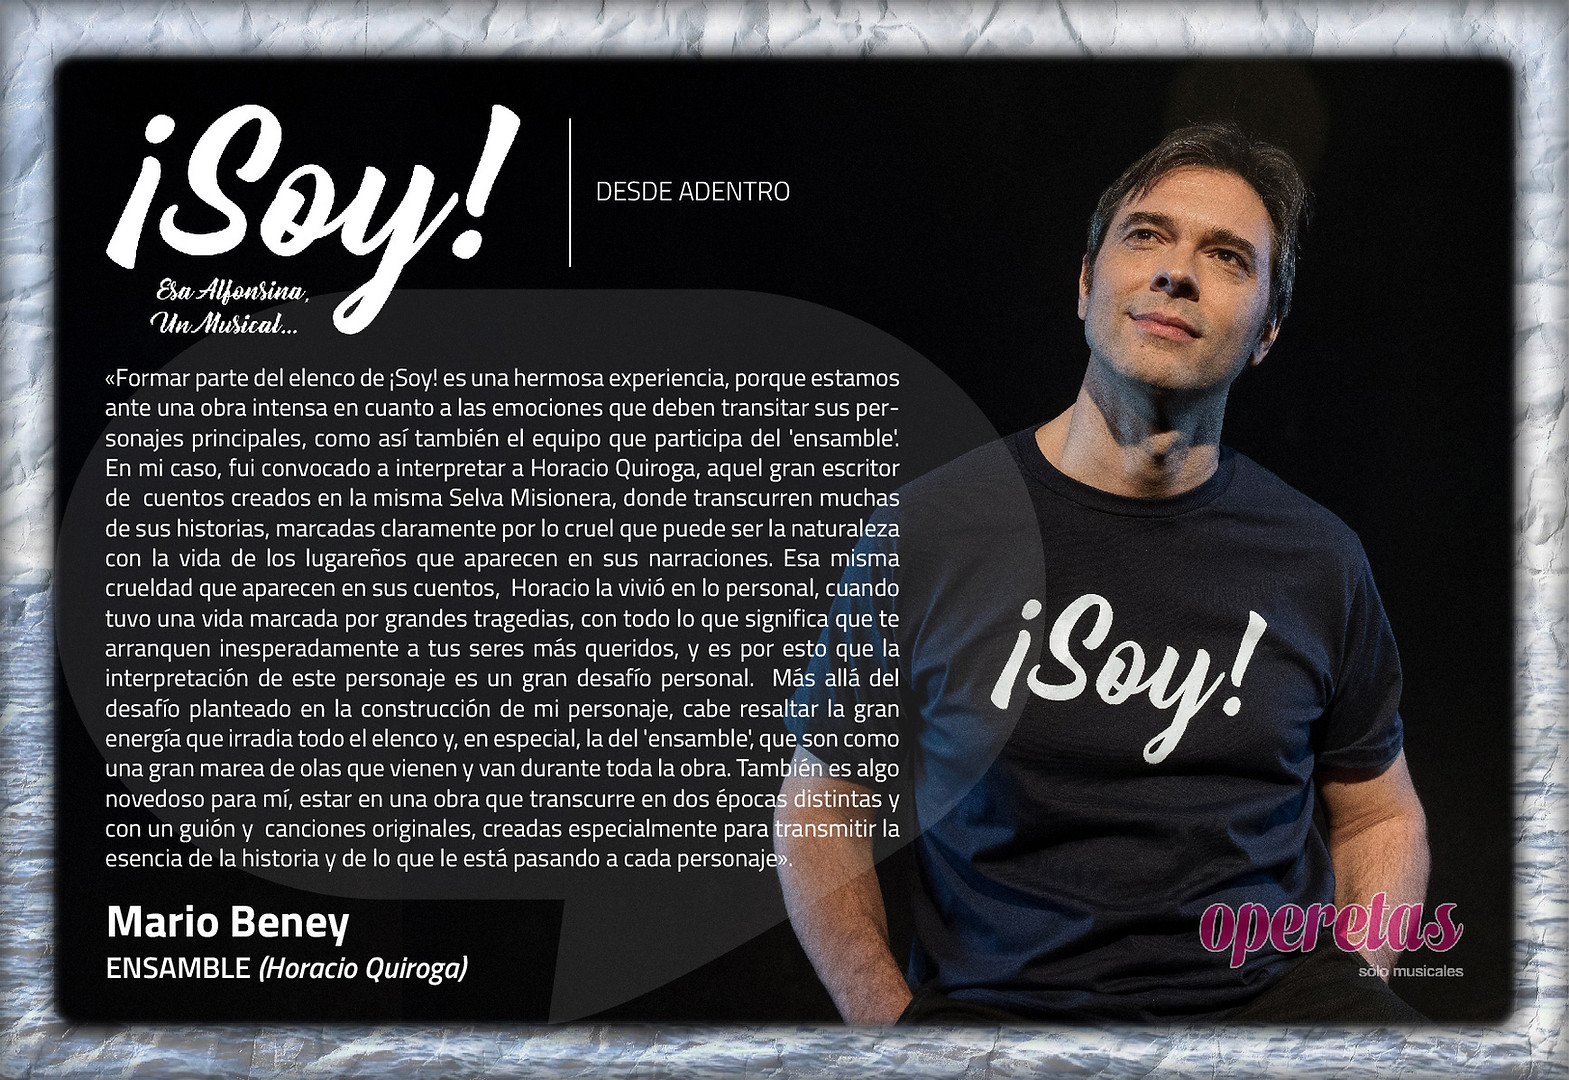 Mario Beney